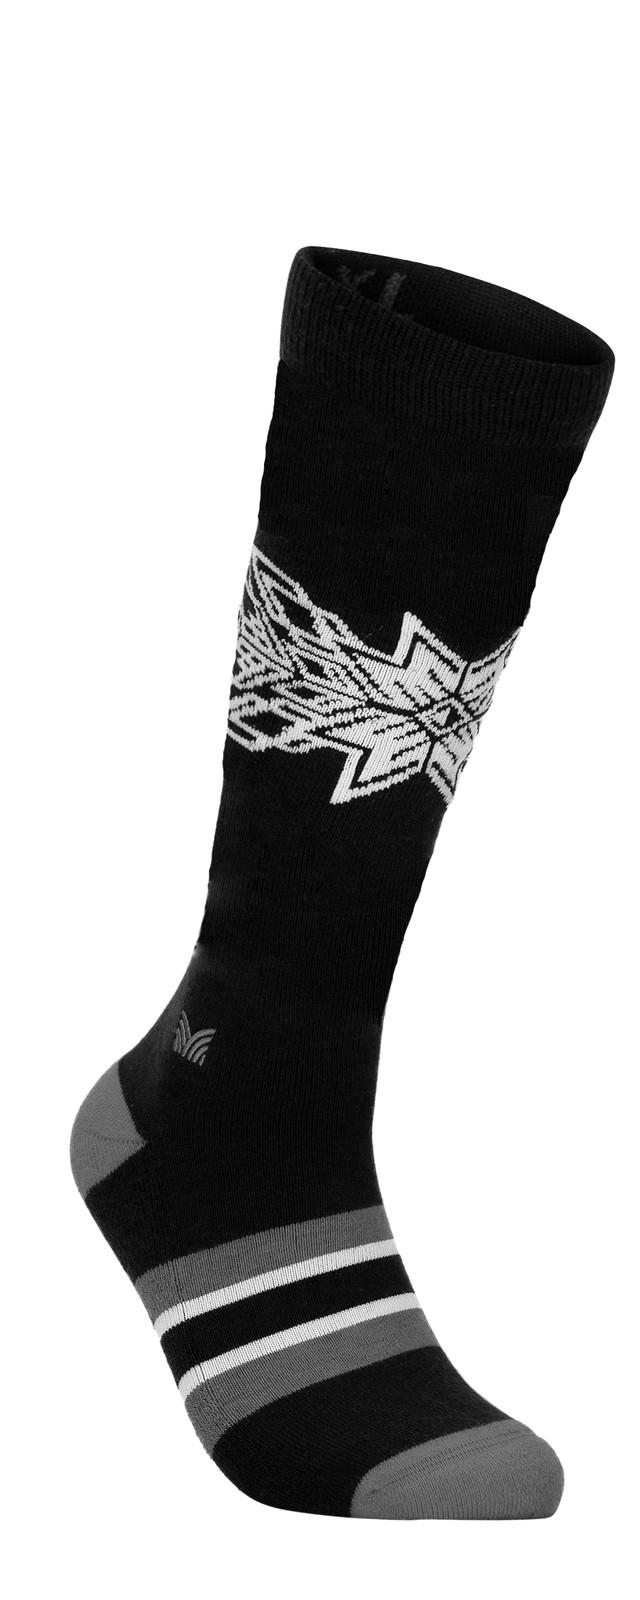 Dale of Norway OL Spirit Sock High, Dark Charcoal/Smoke/Off White, 50131E